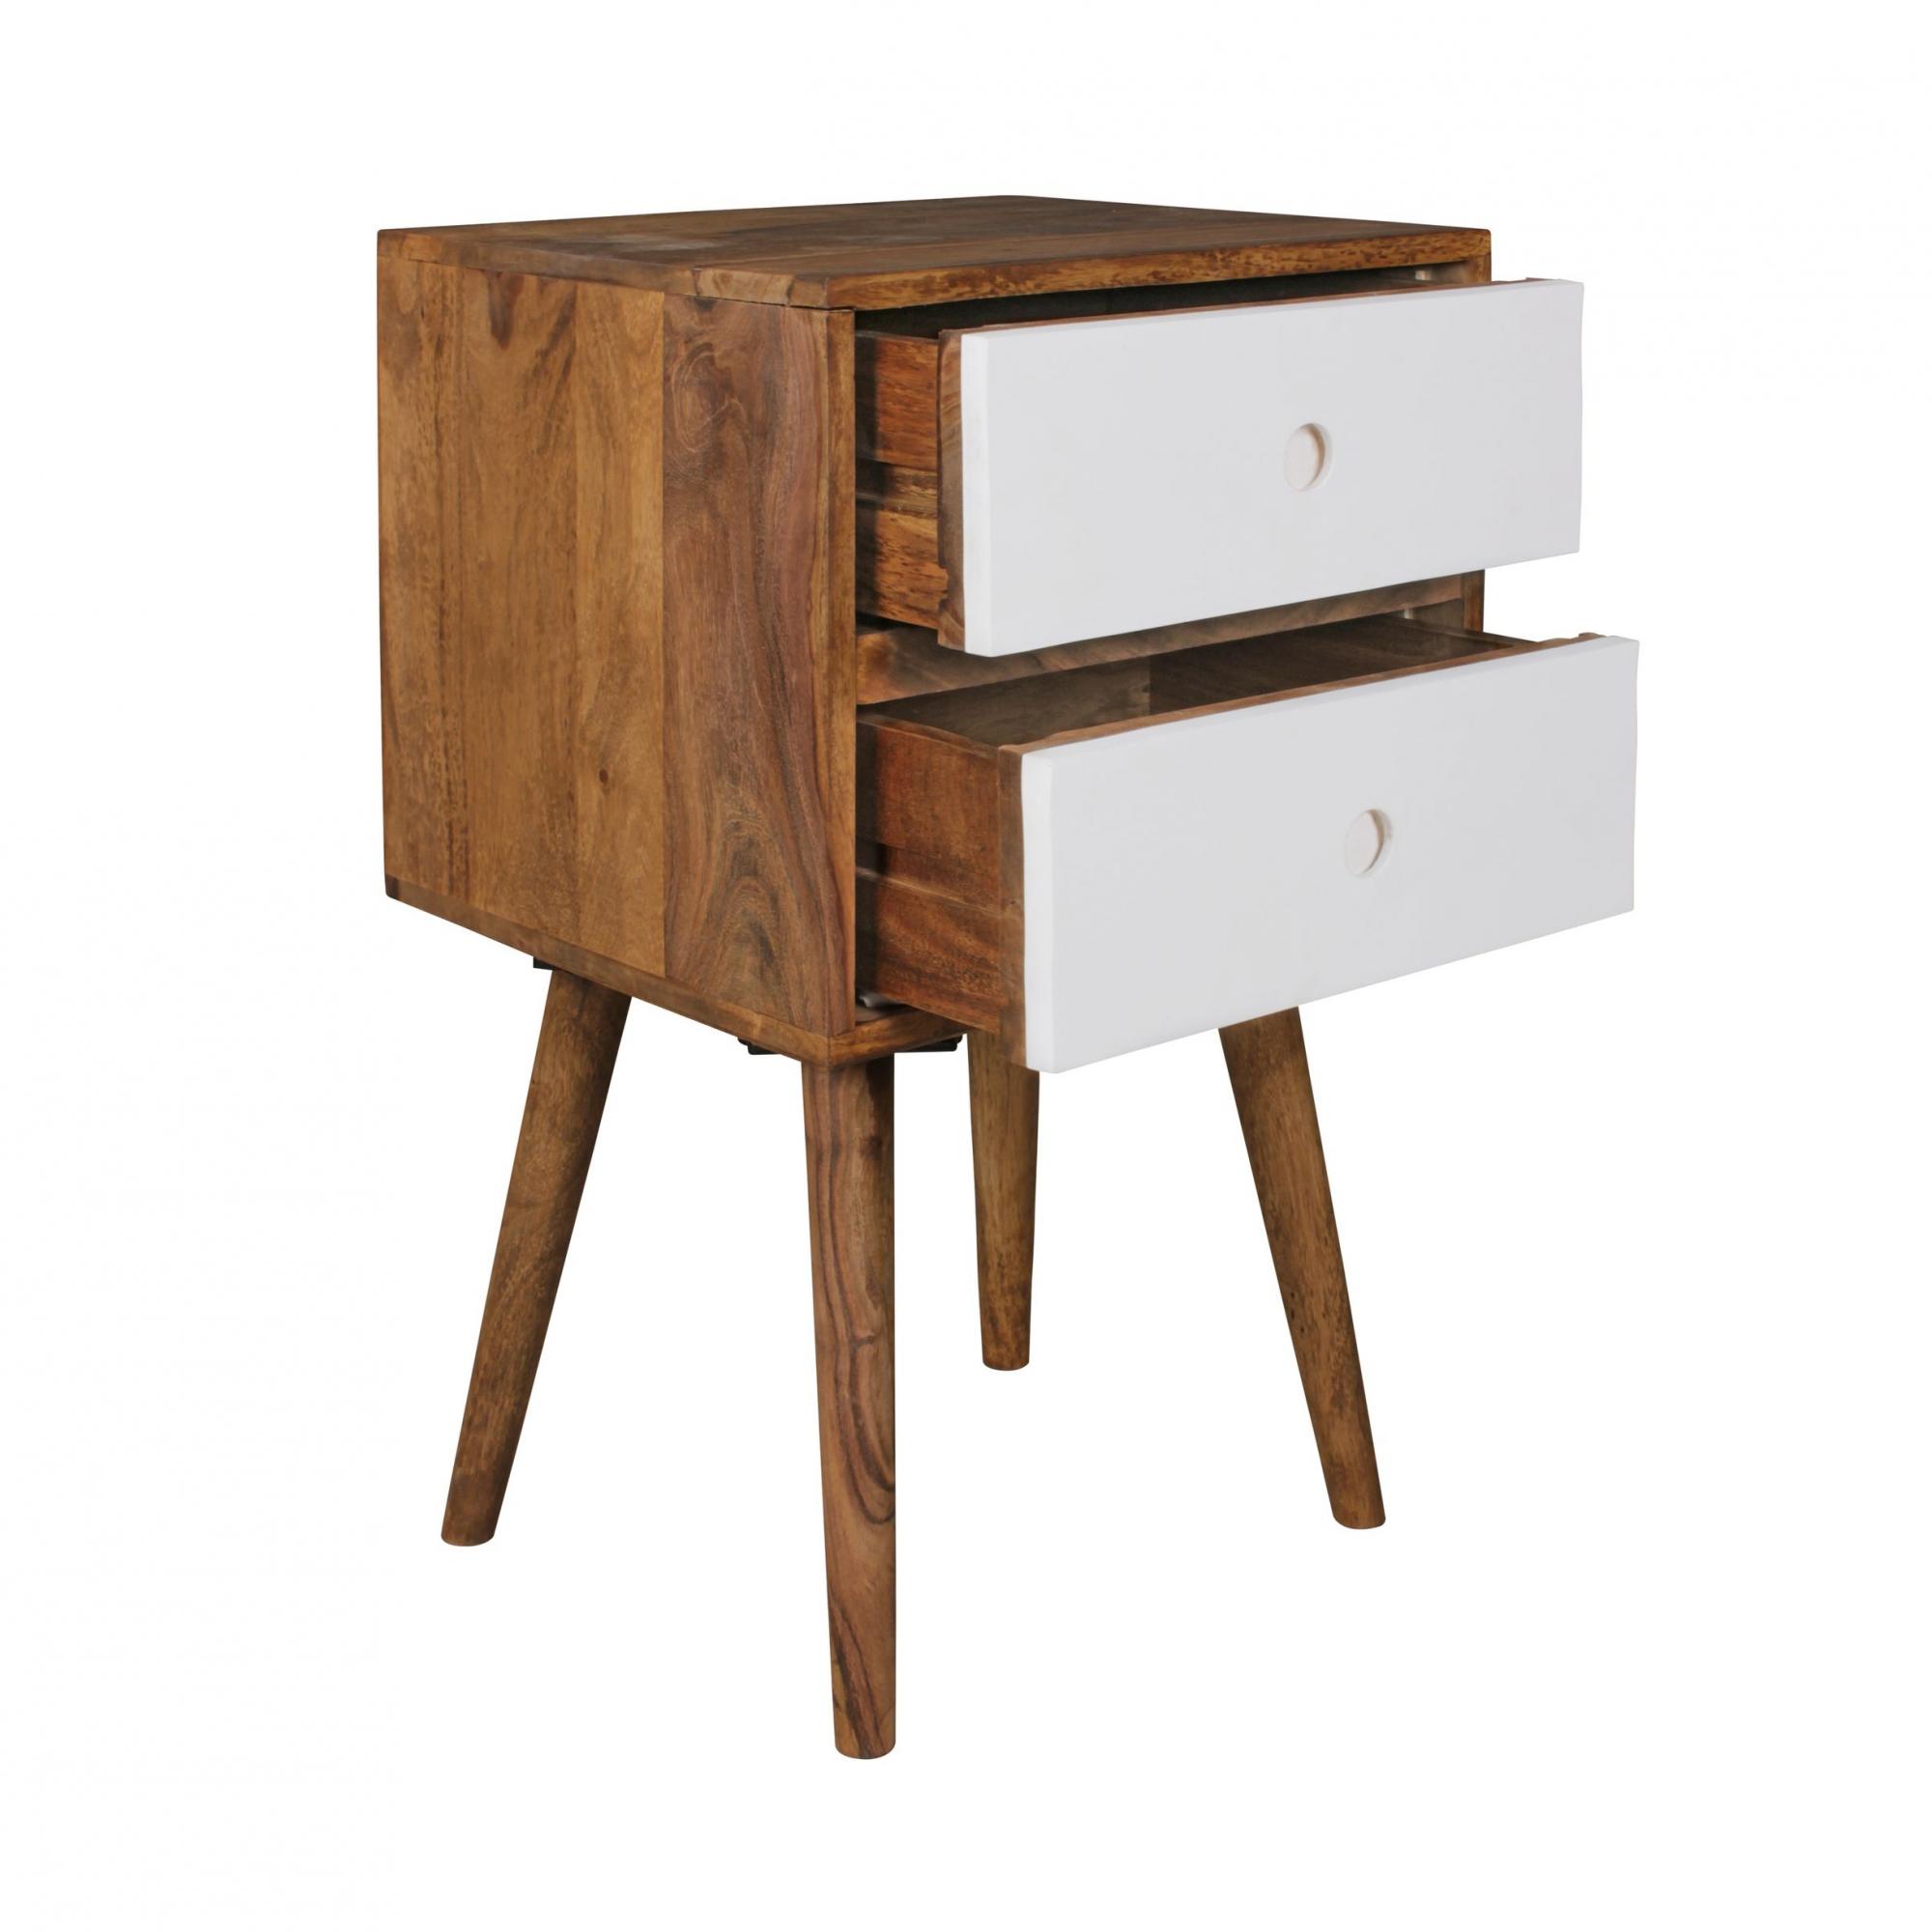 Noční stolek se zásuvkami Repa, 67 cm, masiv Sheesham, bílá